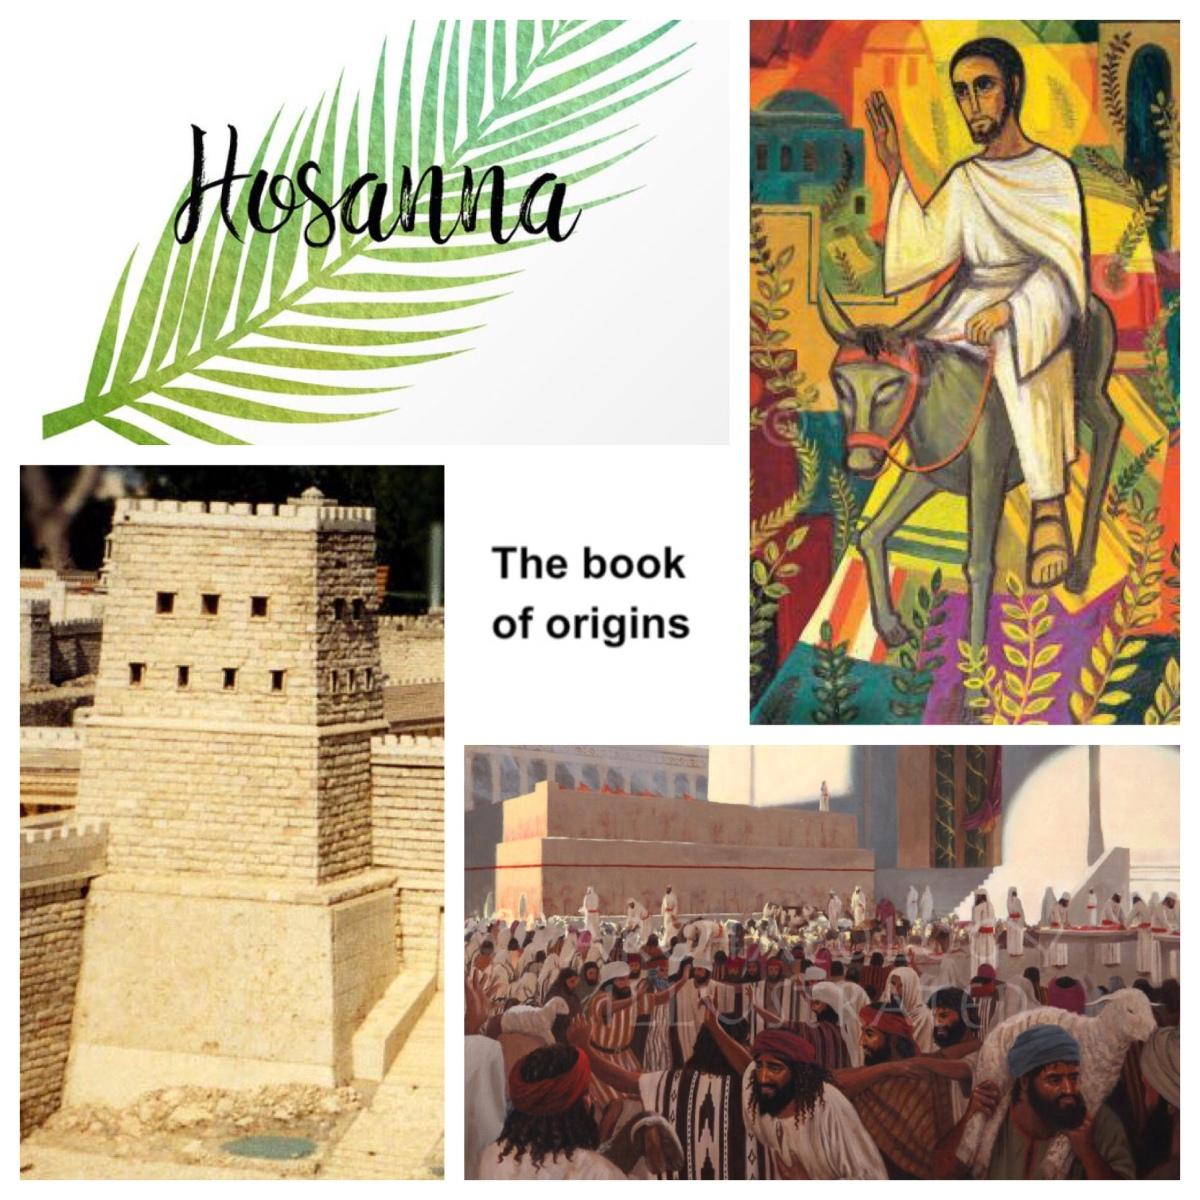 Towards Palm Sunday (Matt 21): Passover andpolitics